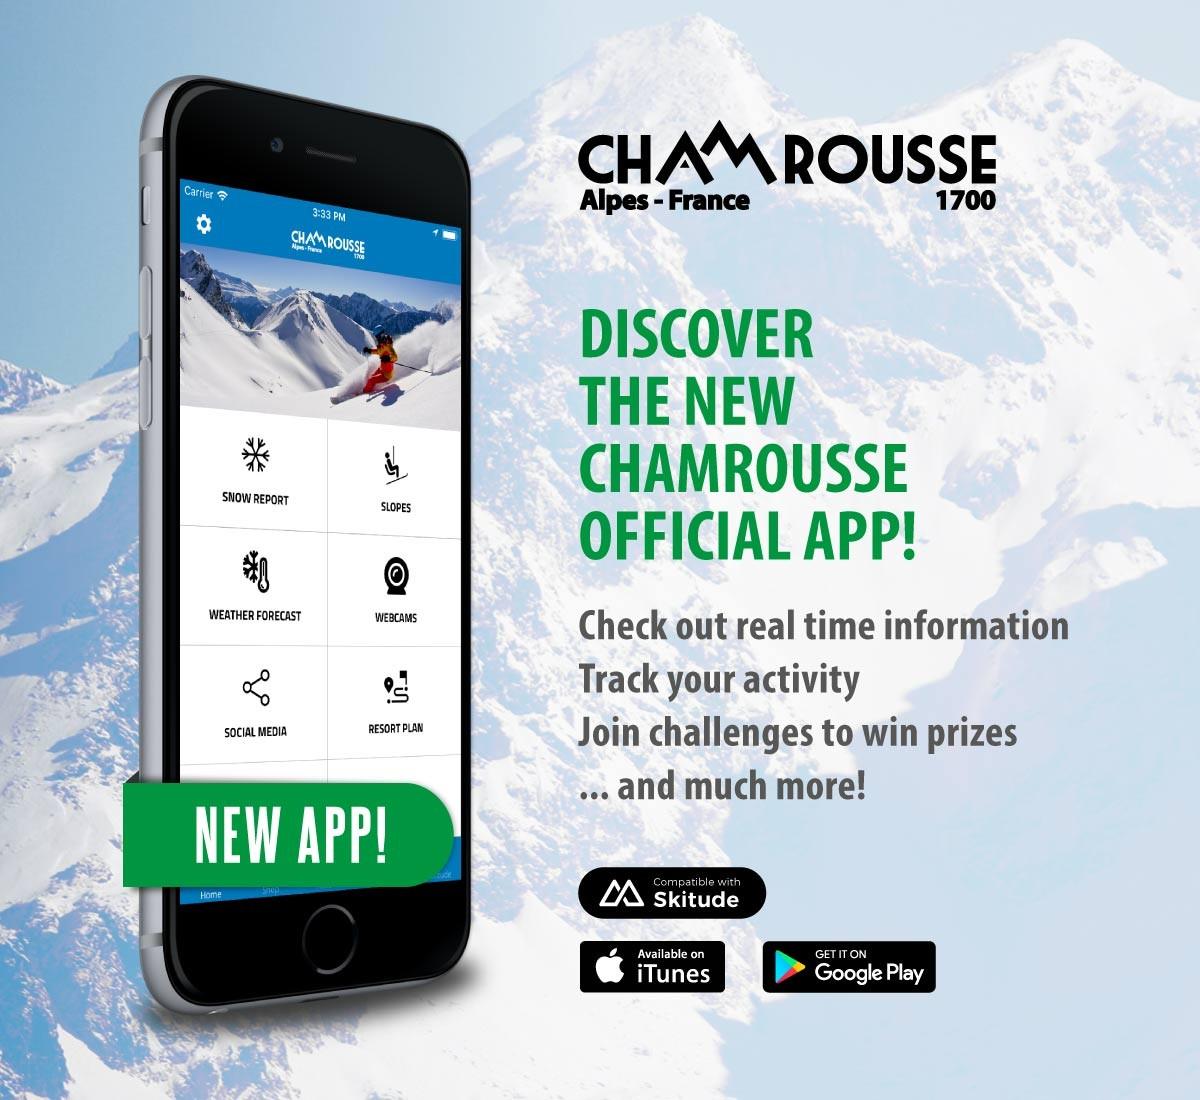 Chamrousse app